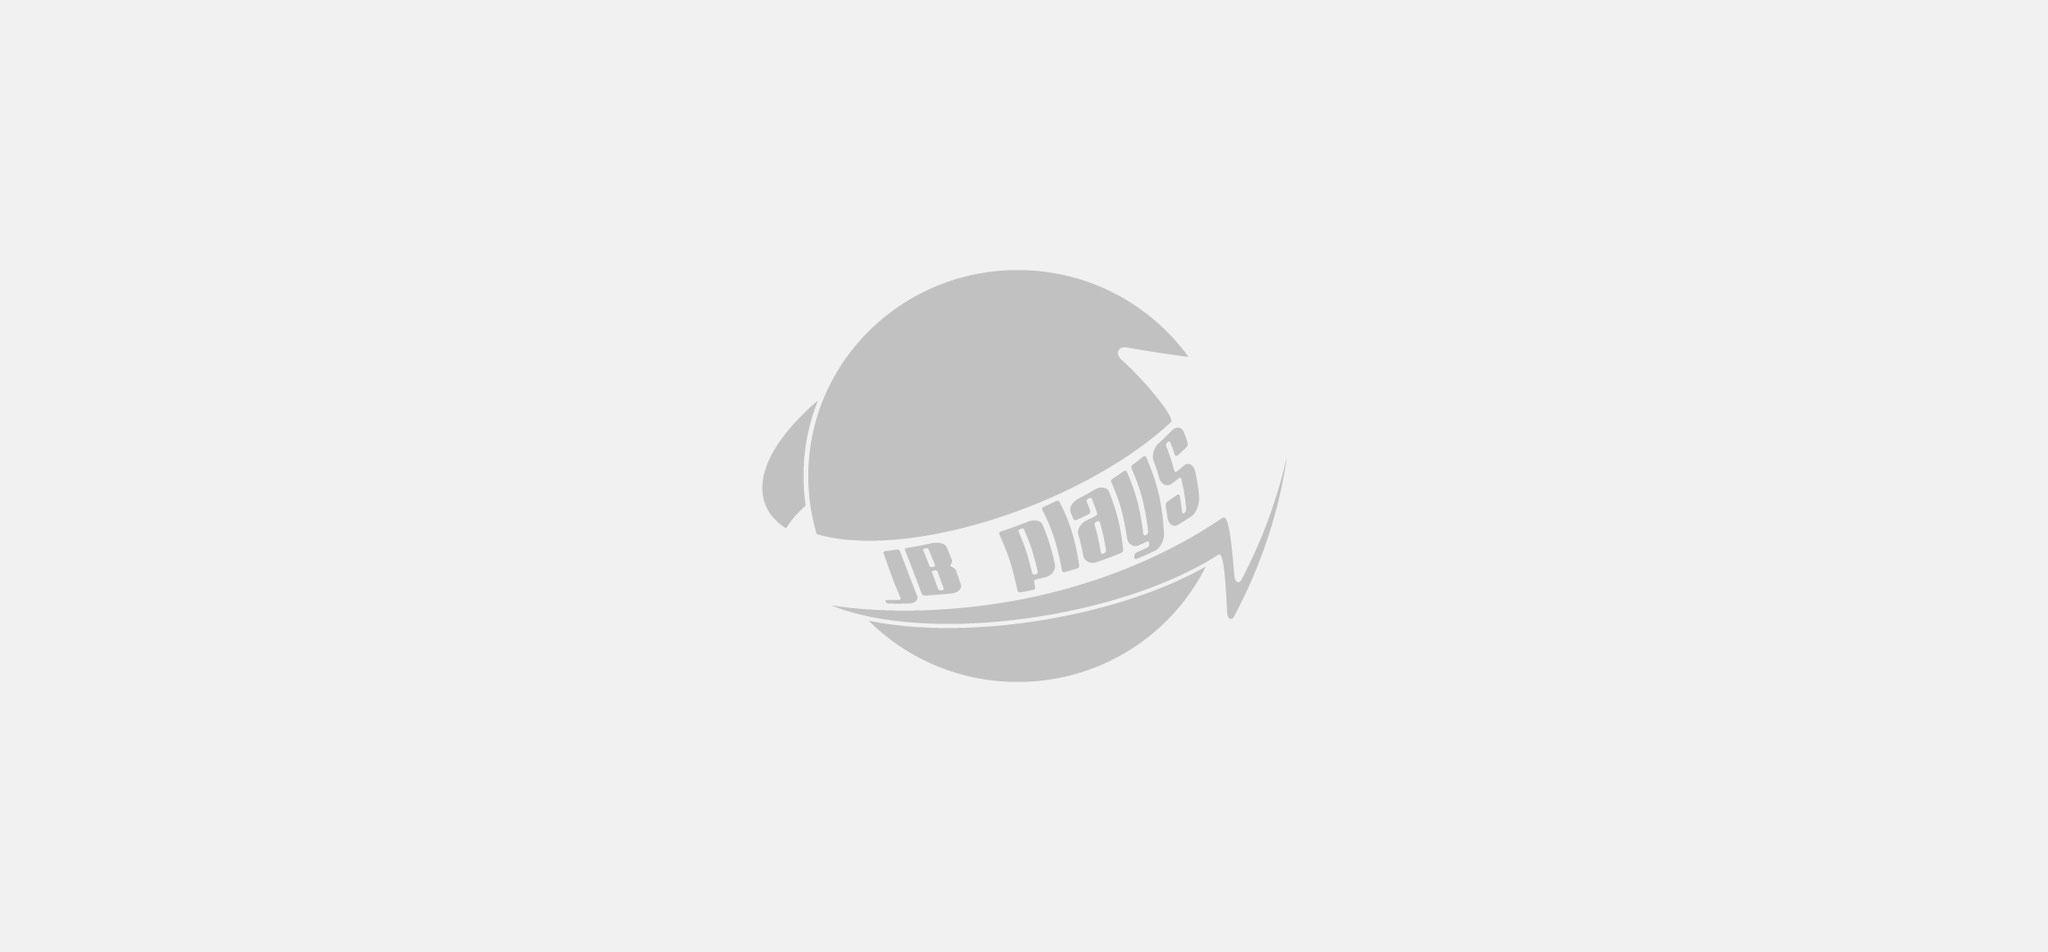 JAN BEHRENS | logo JB plays, grauversion – infragrau, gute gestaltung